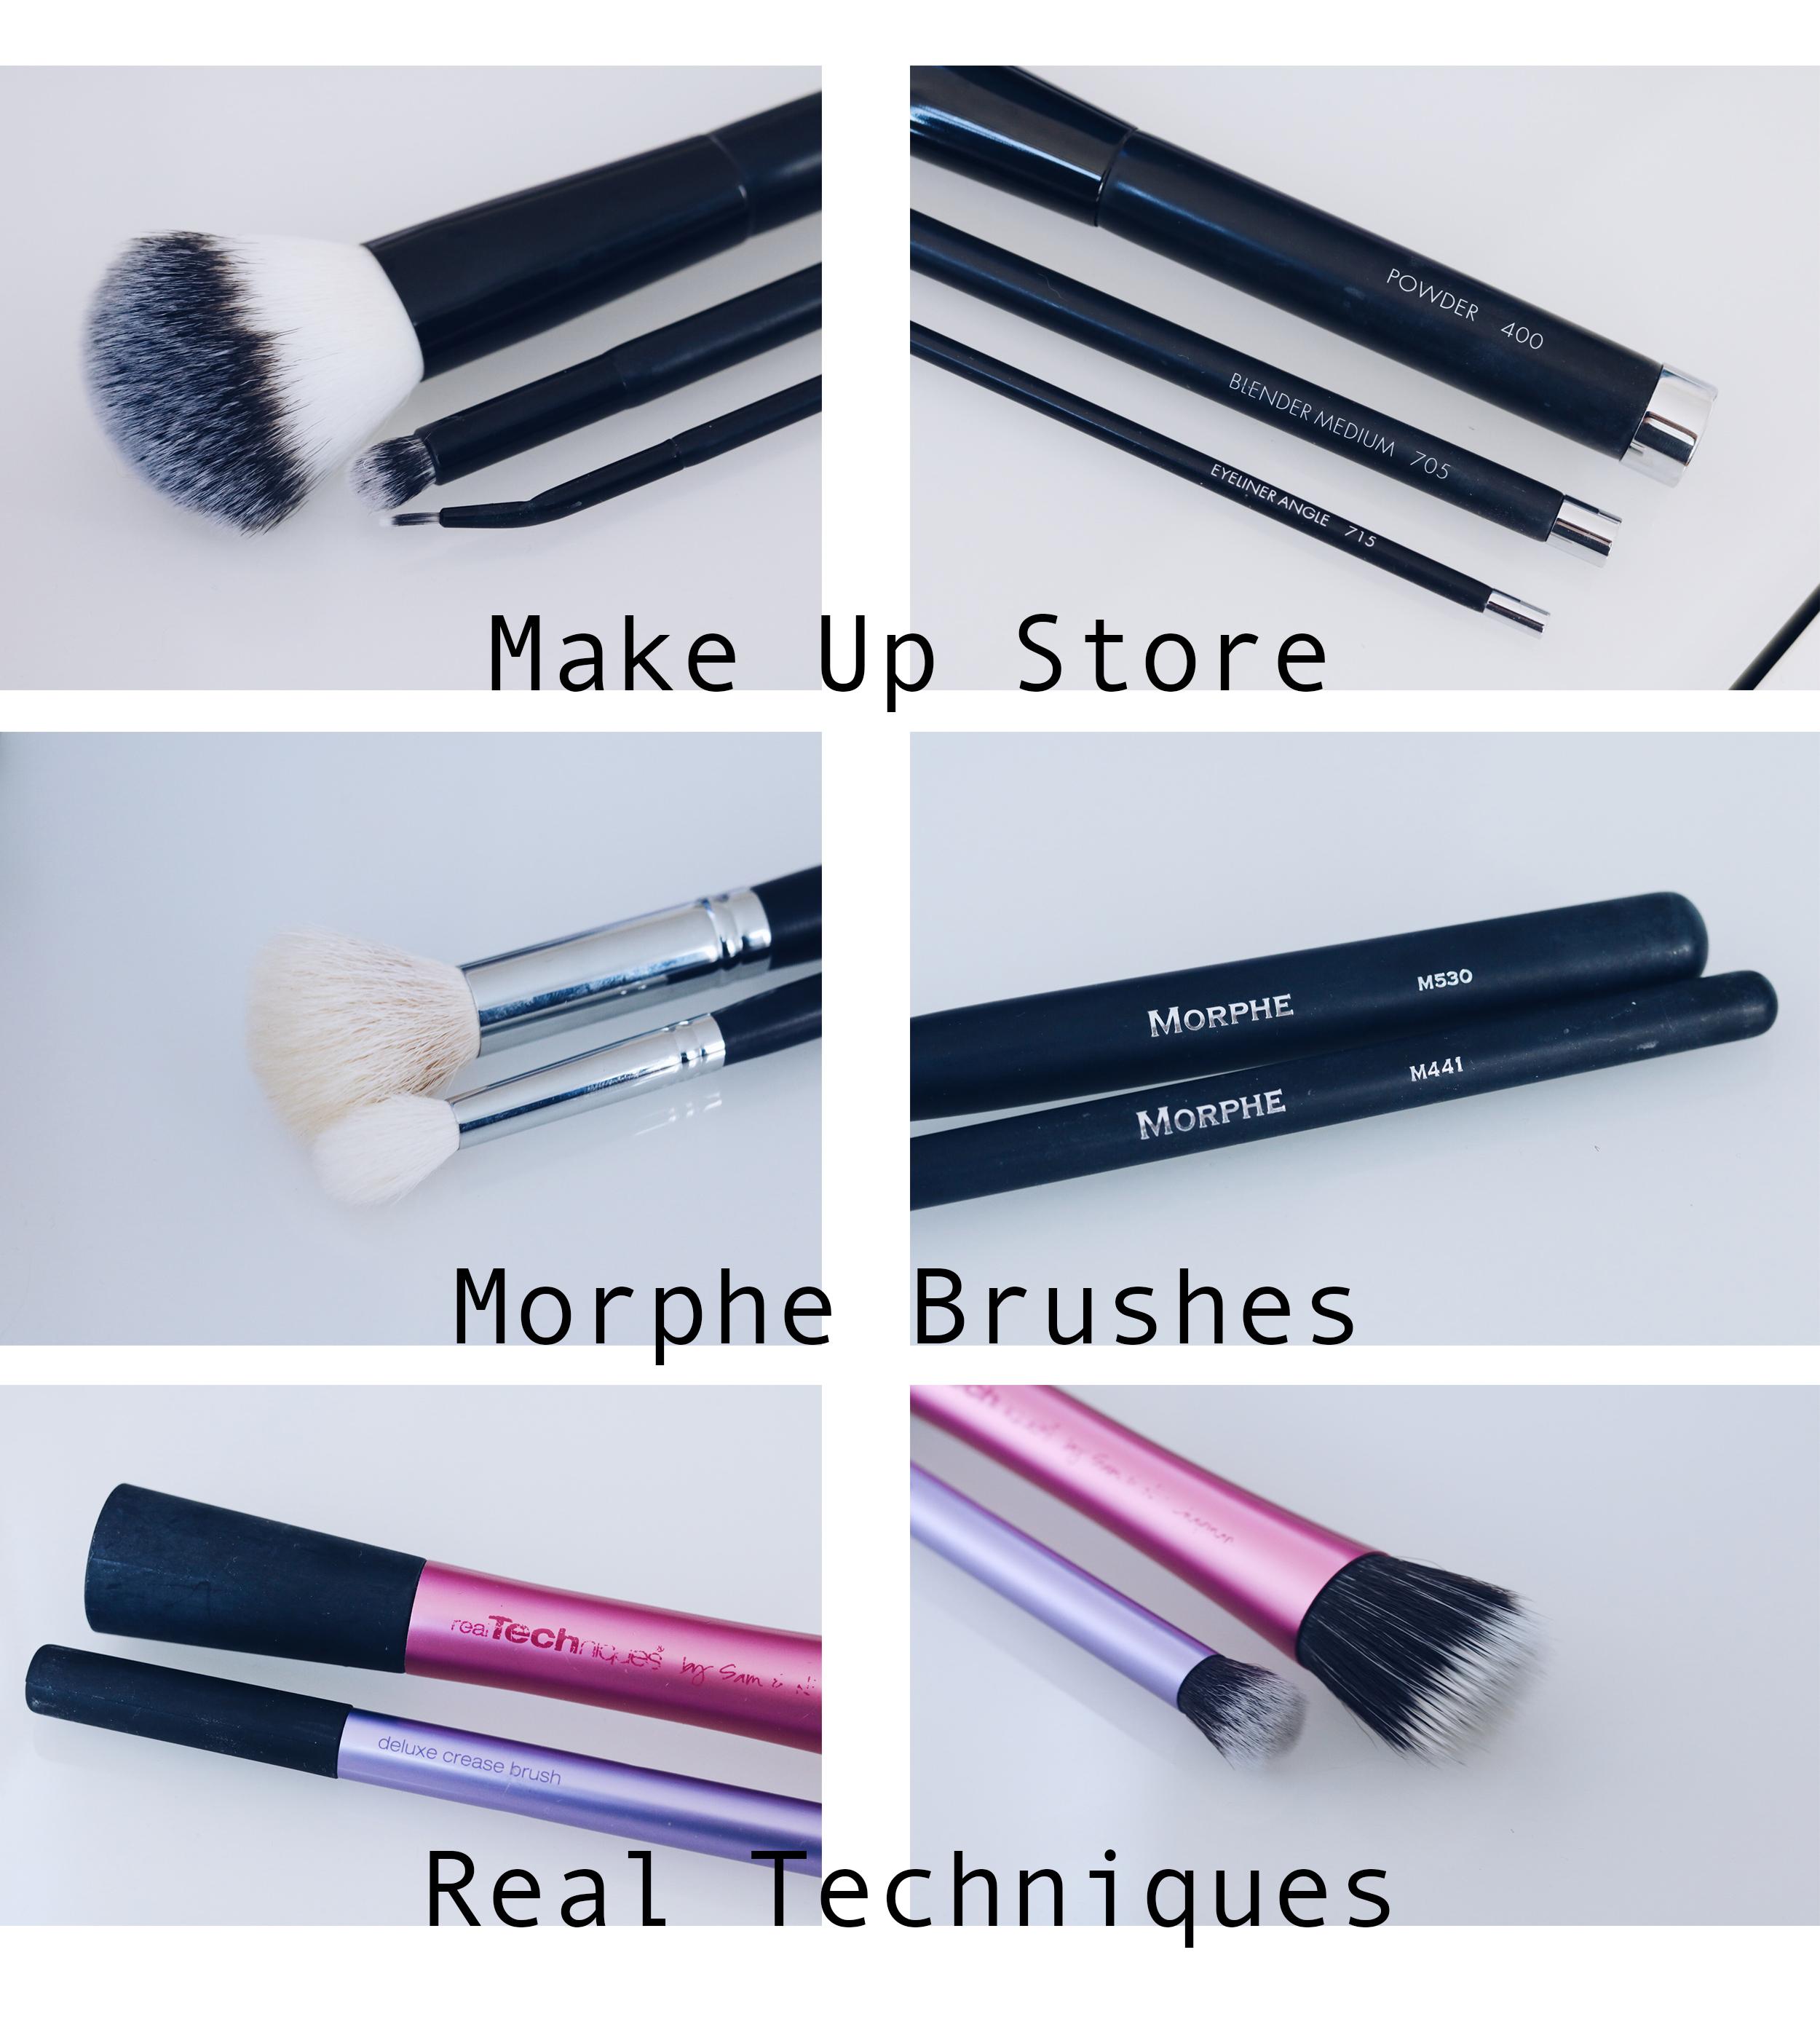 Mina absoluta favoriter bland sminkborstar MUS Make up store Morphe Real Techniques djurtester cruelty free CF amandahans skönhetsblogg skönhetsbloggare